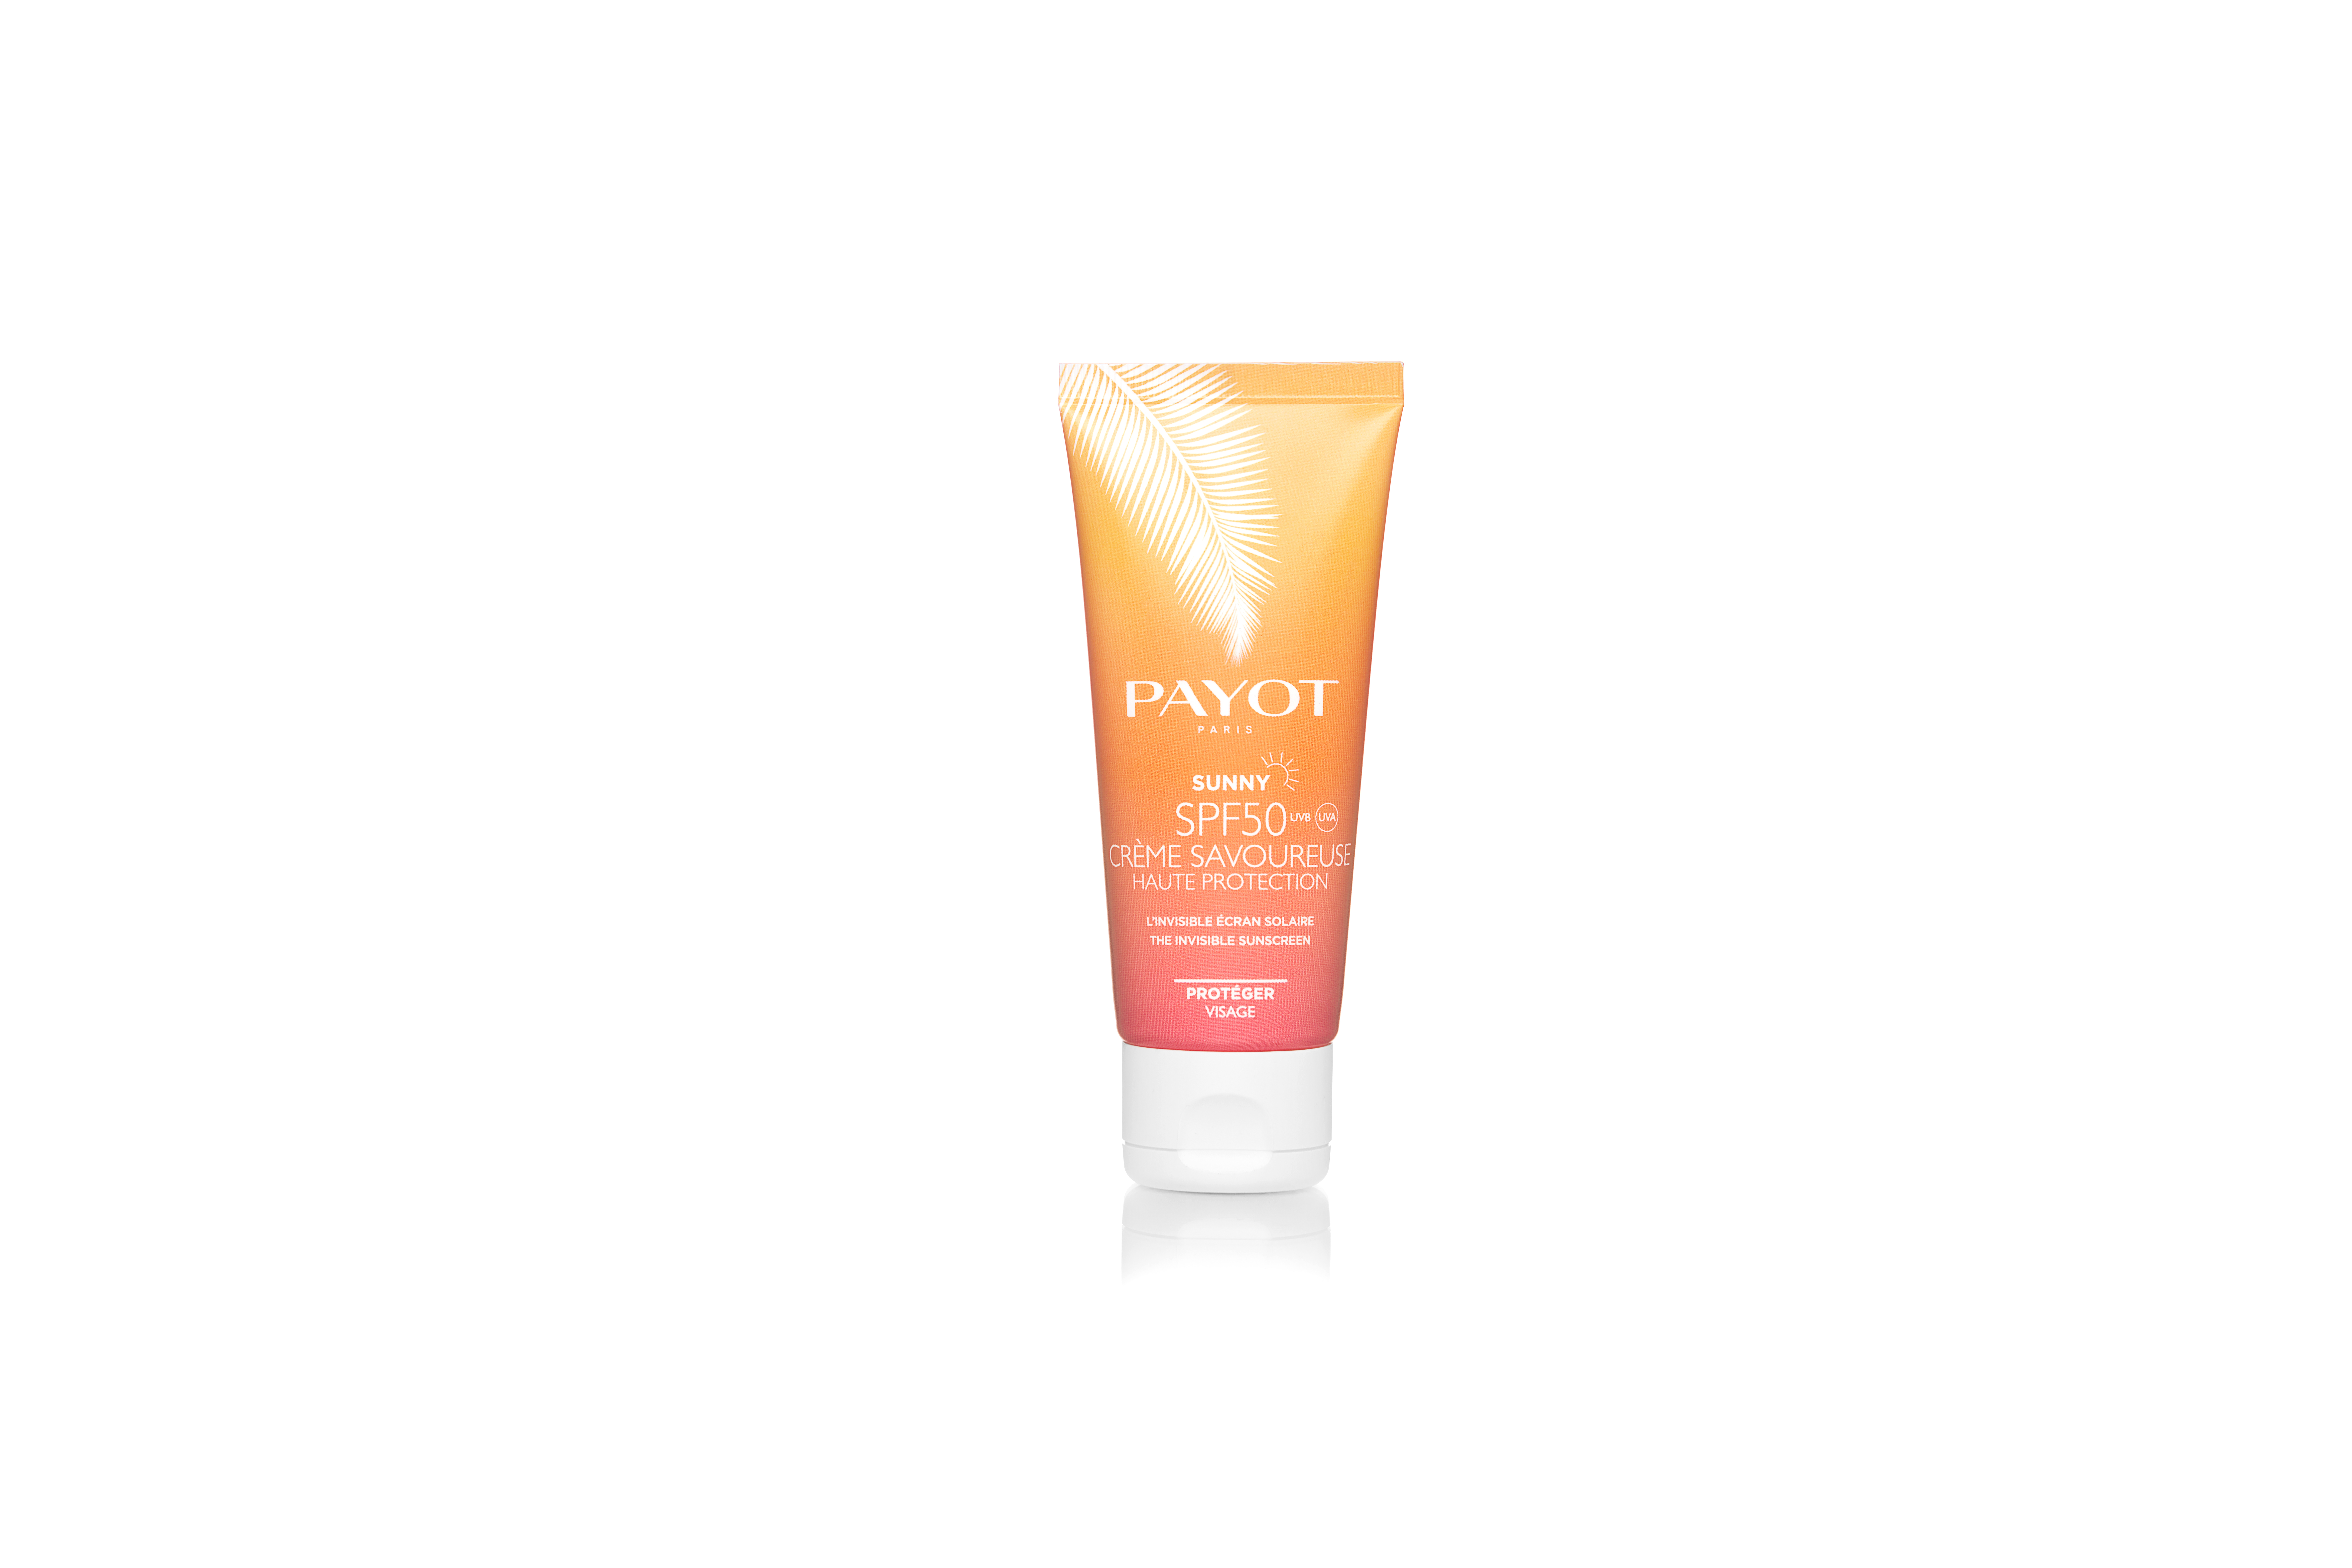 PAYOT Sunny Crème savoureuse SPF50